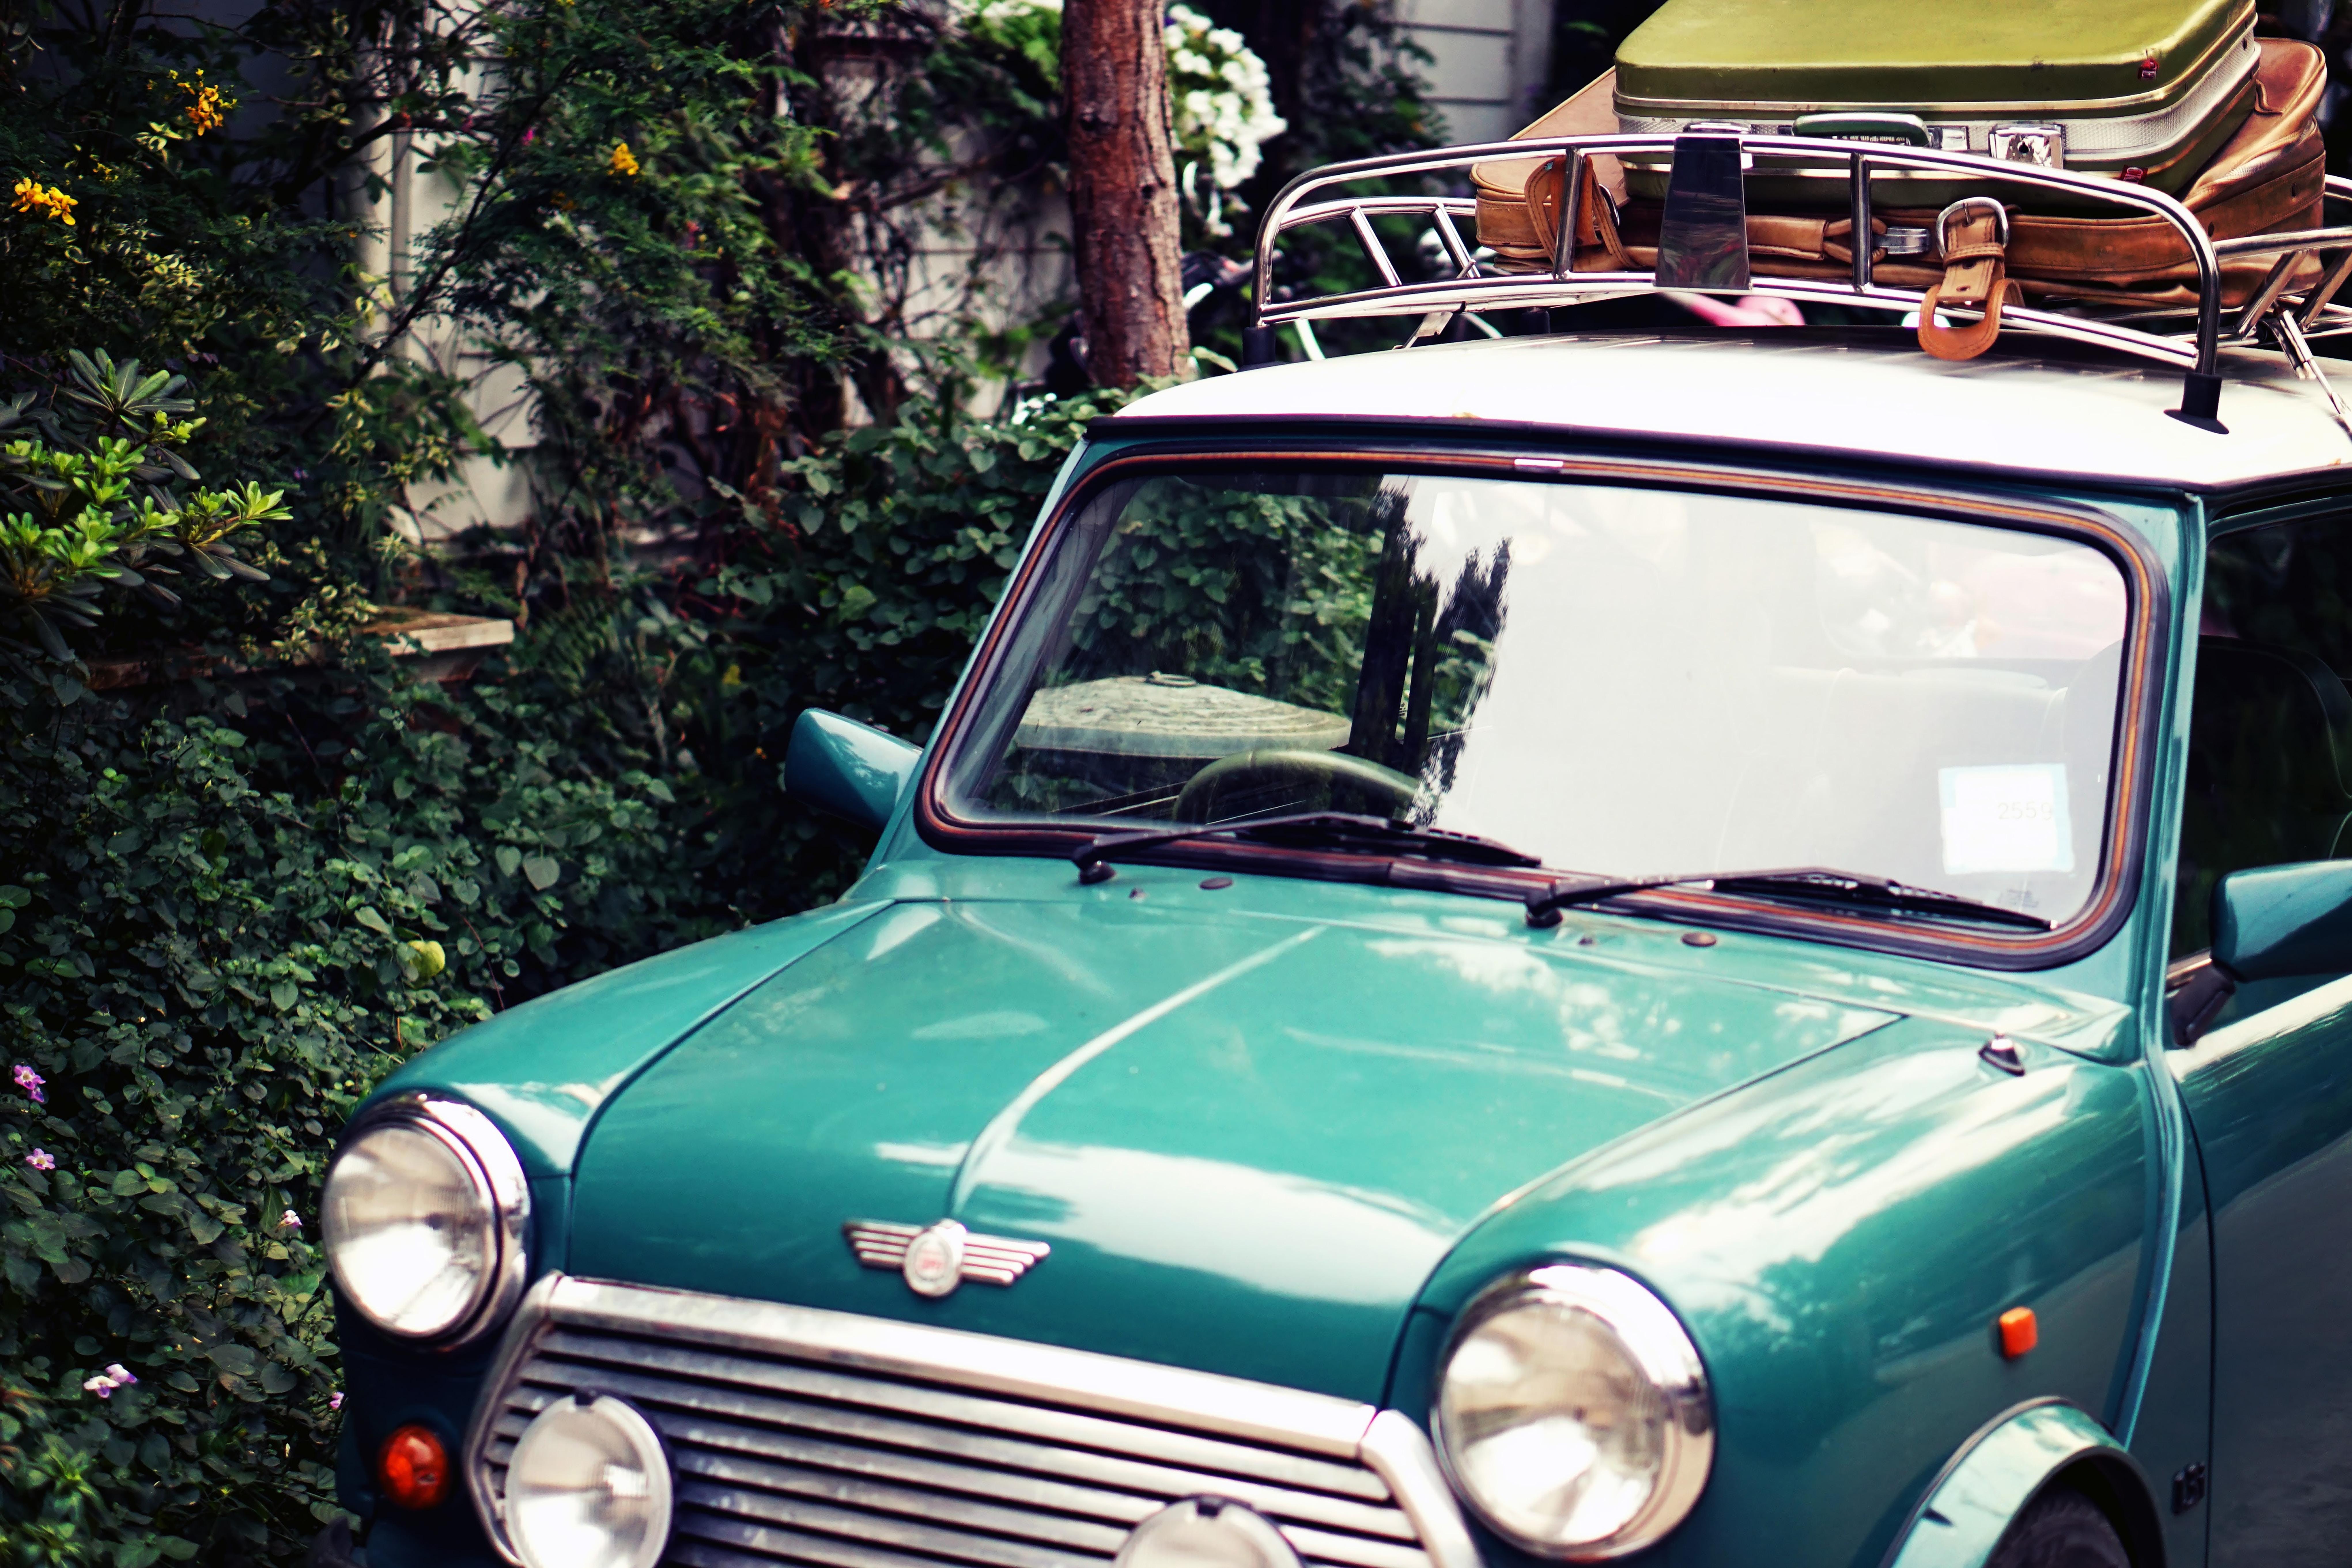 classic green Mini Morris parked near bush at daytime